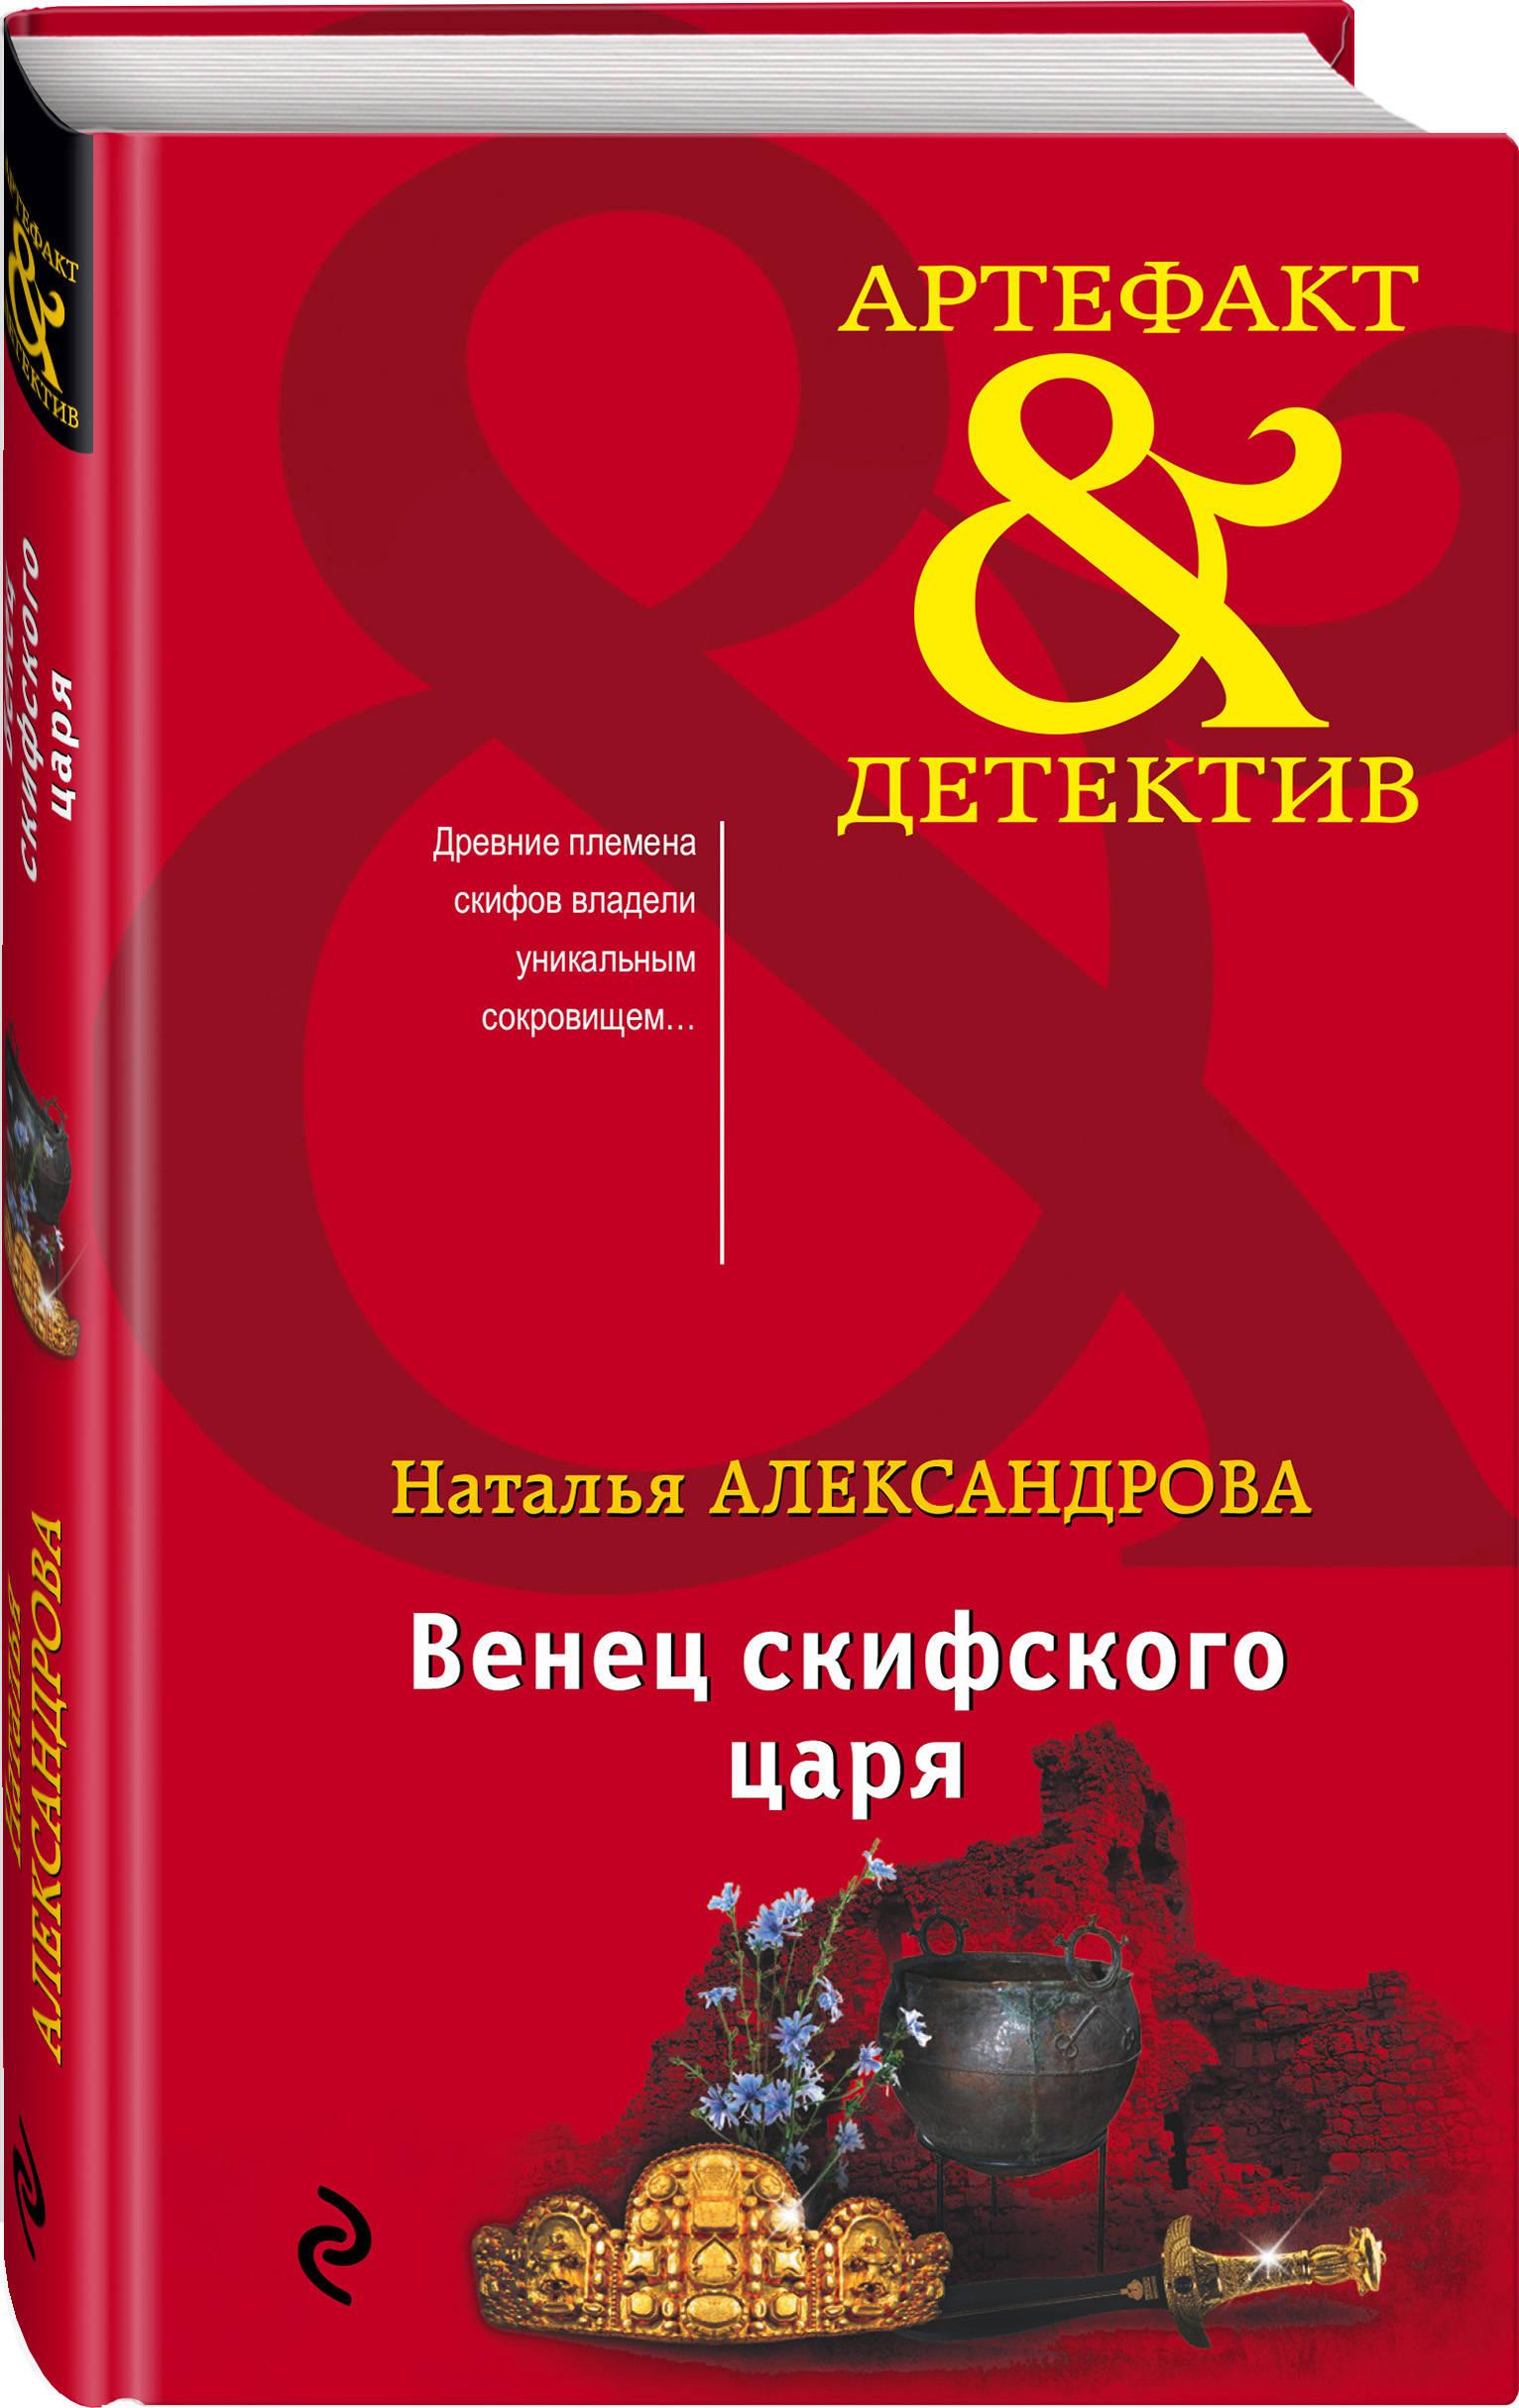 Наталья Александрова Венец скифского царя